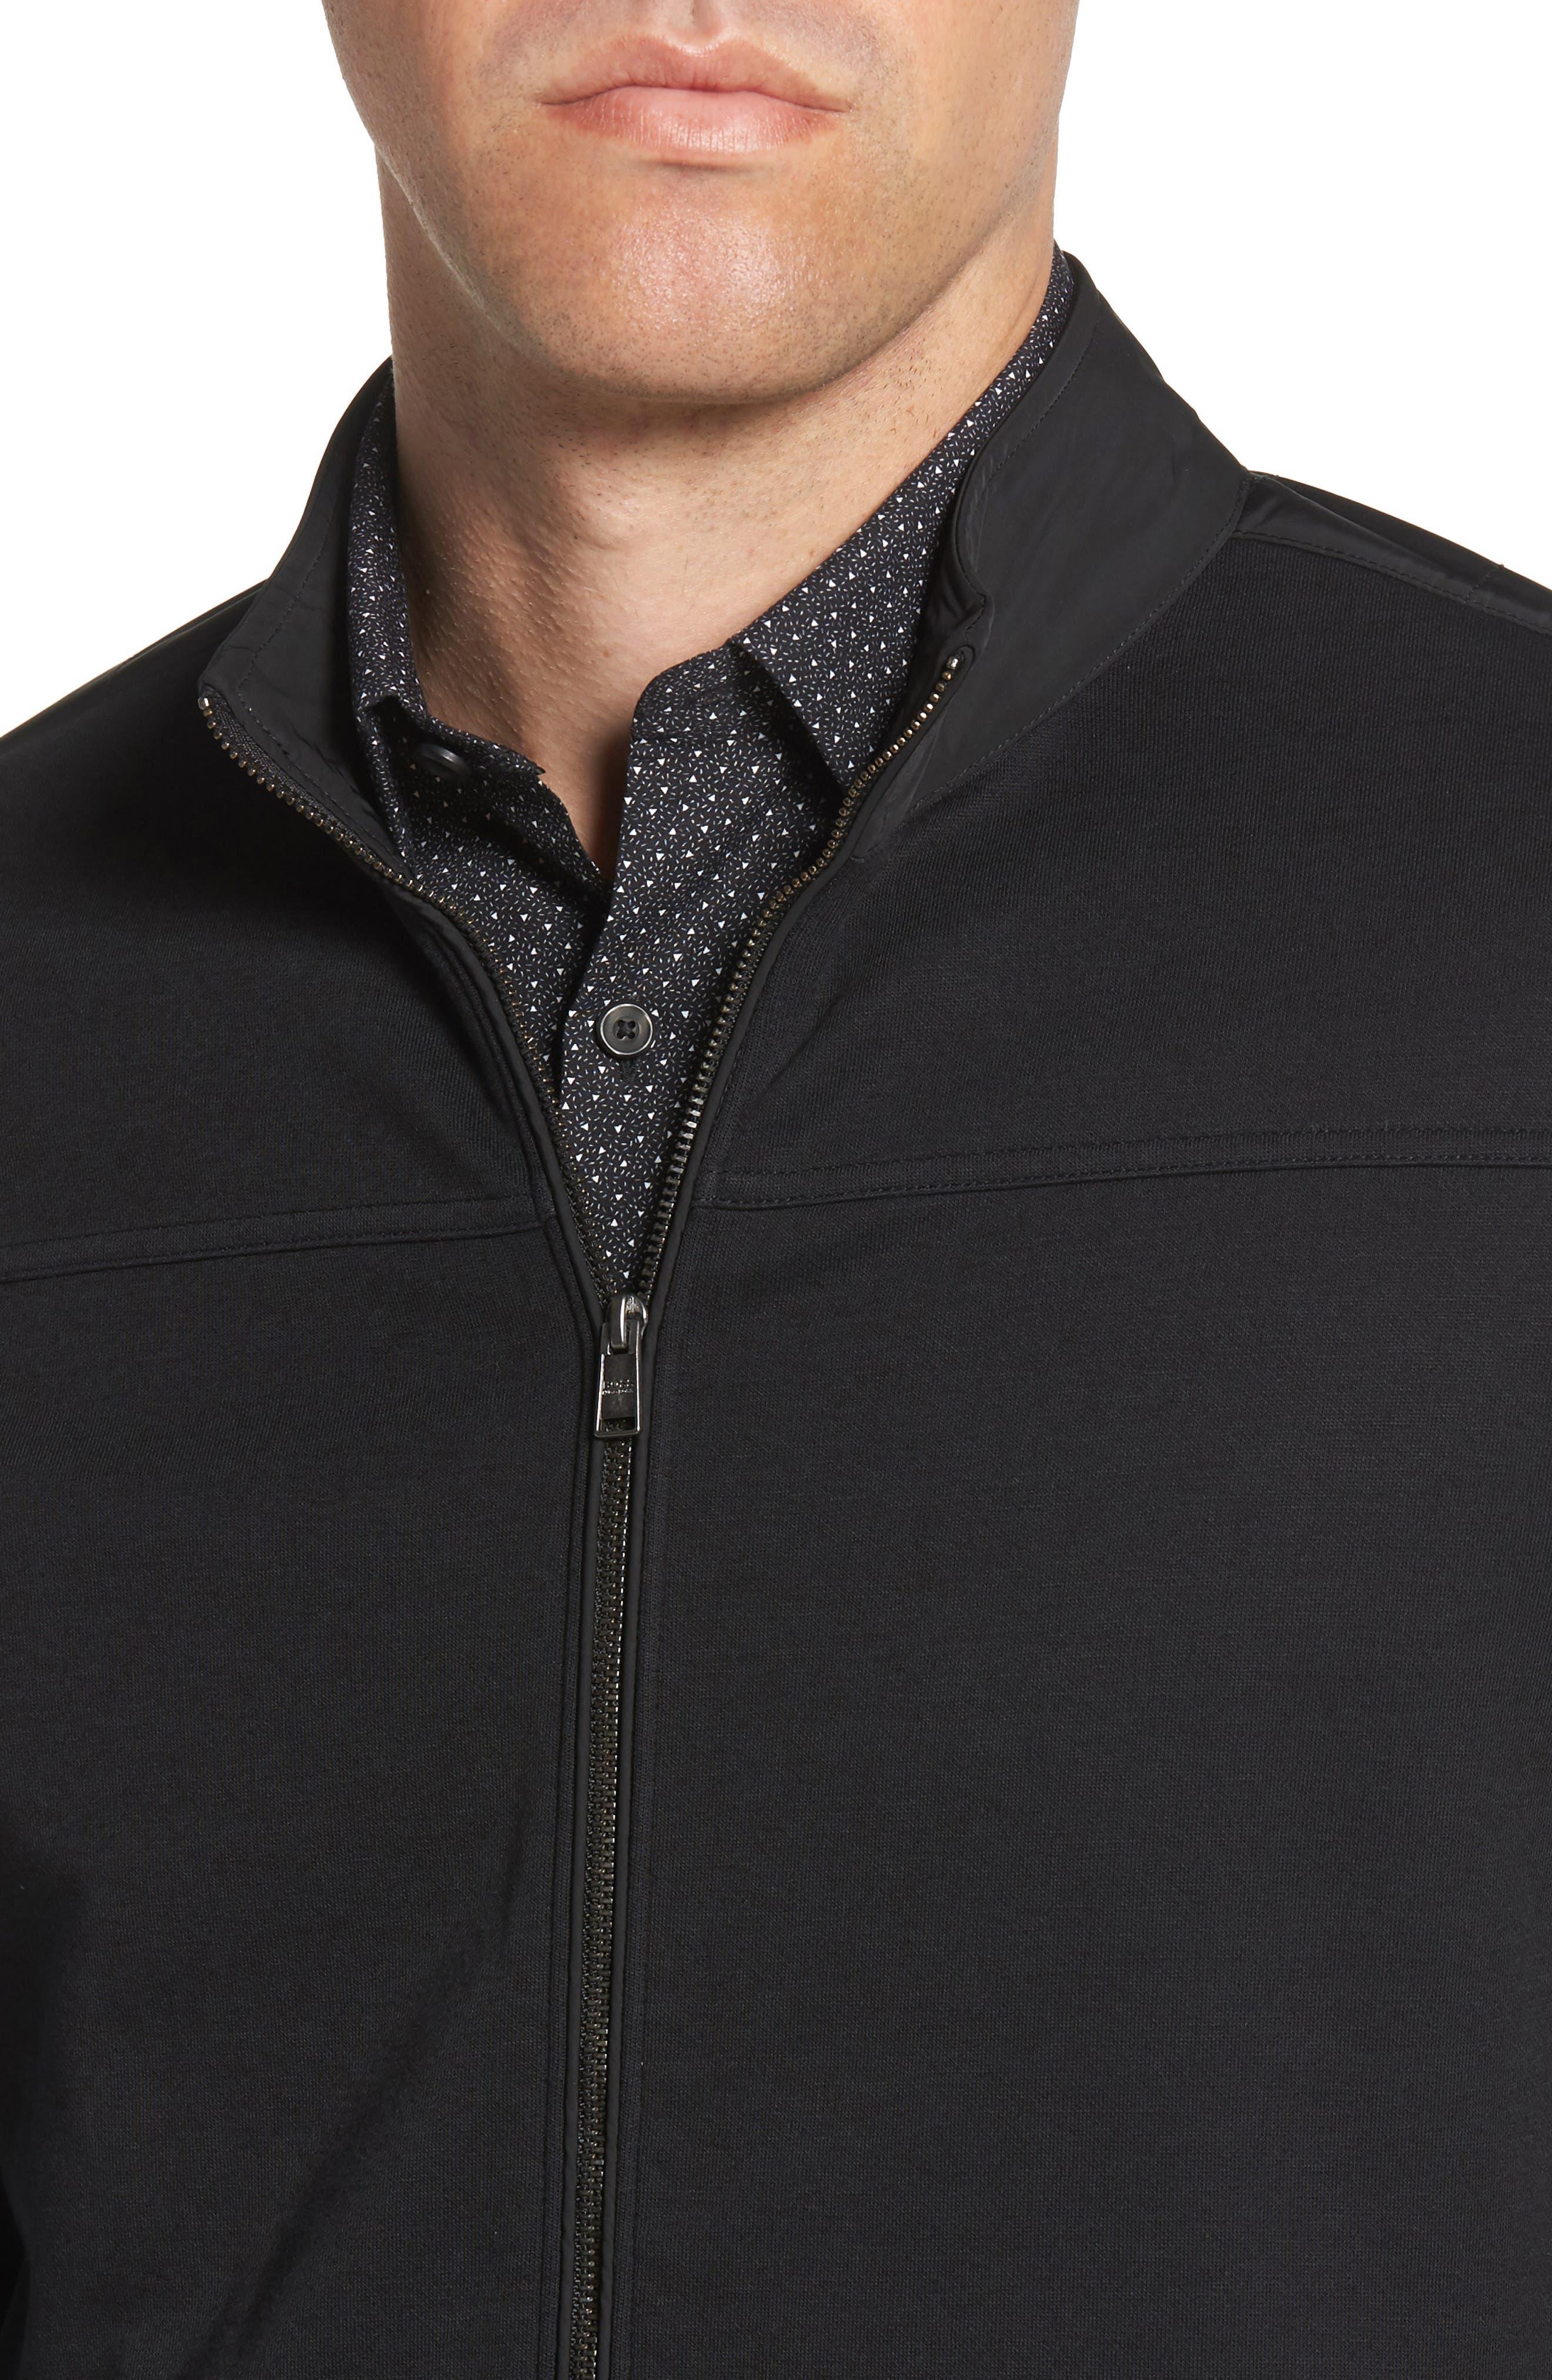 Soule Slim Fit Moto Jacket,                             Alternate thumbnail 4, color,                             BLACK